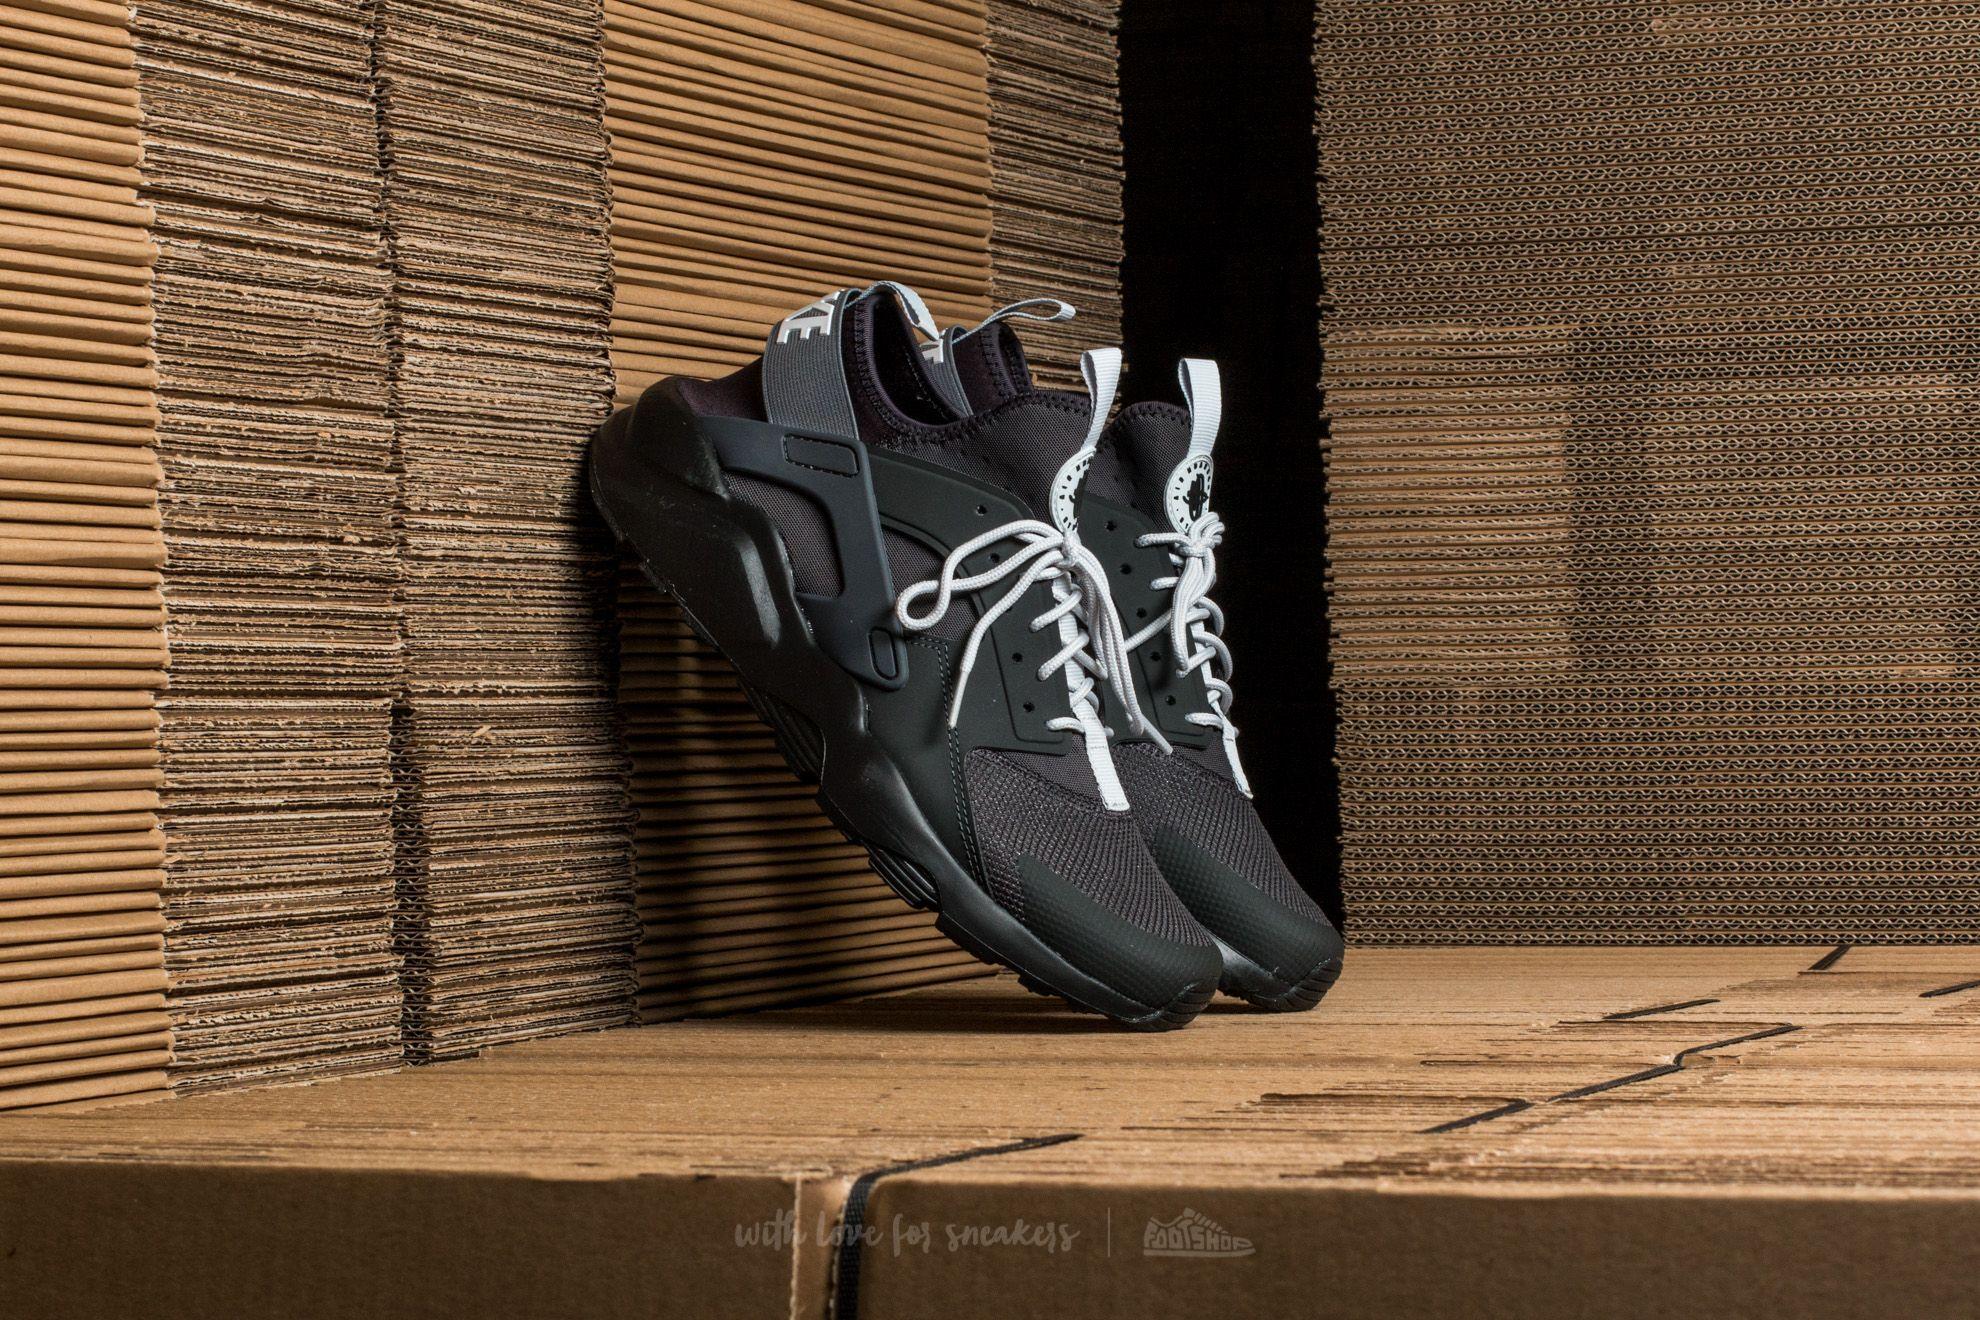 e47c6348757 Nike Air Huarache Run Ultra Anthracite  Black-Black-White